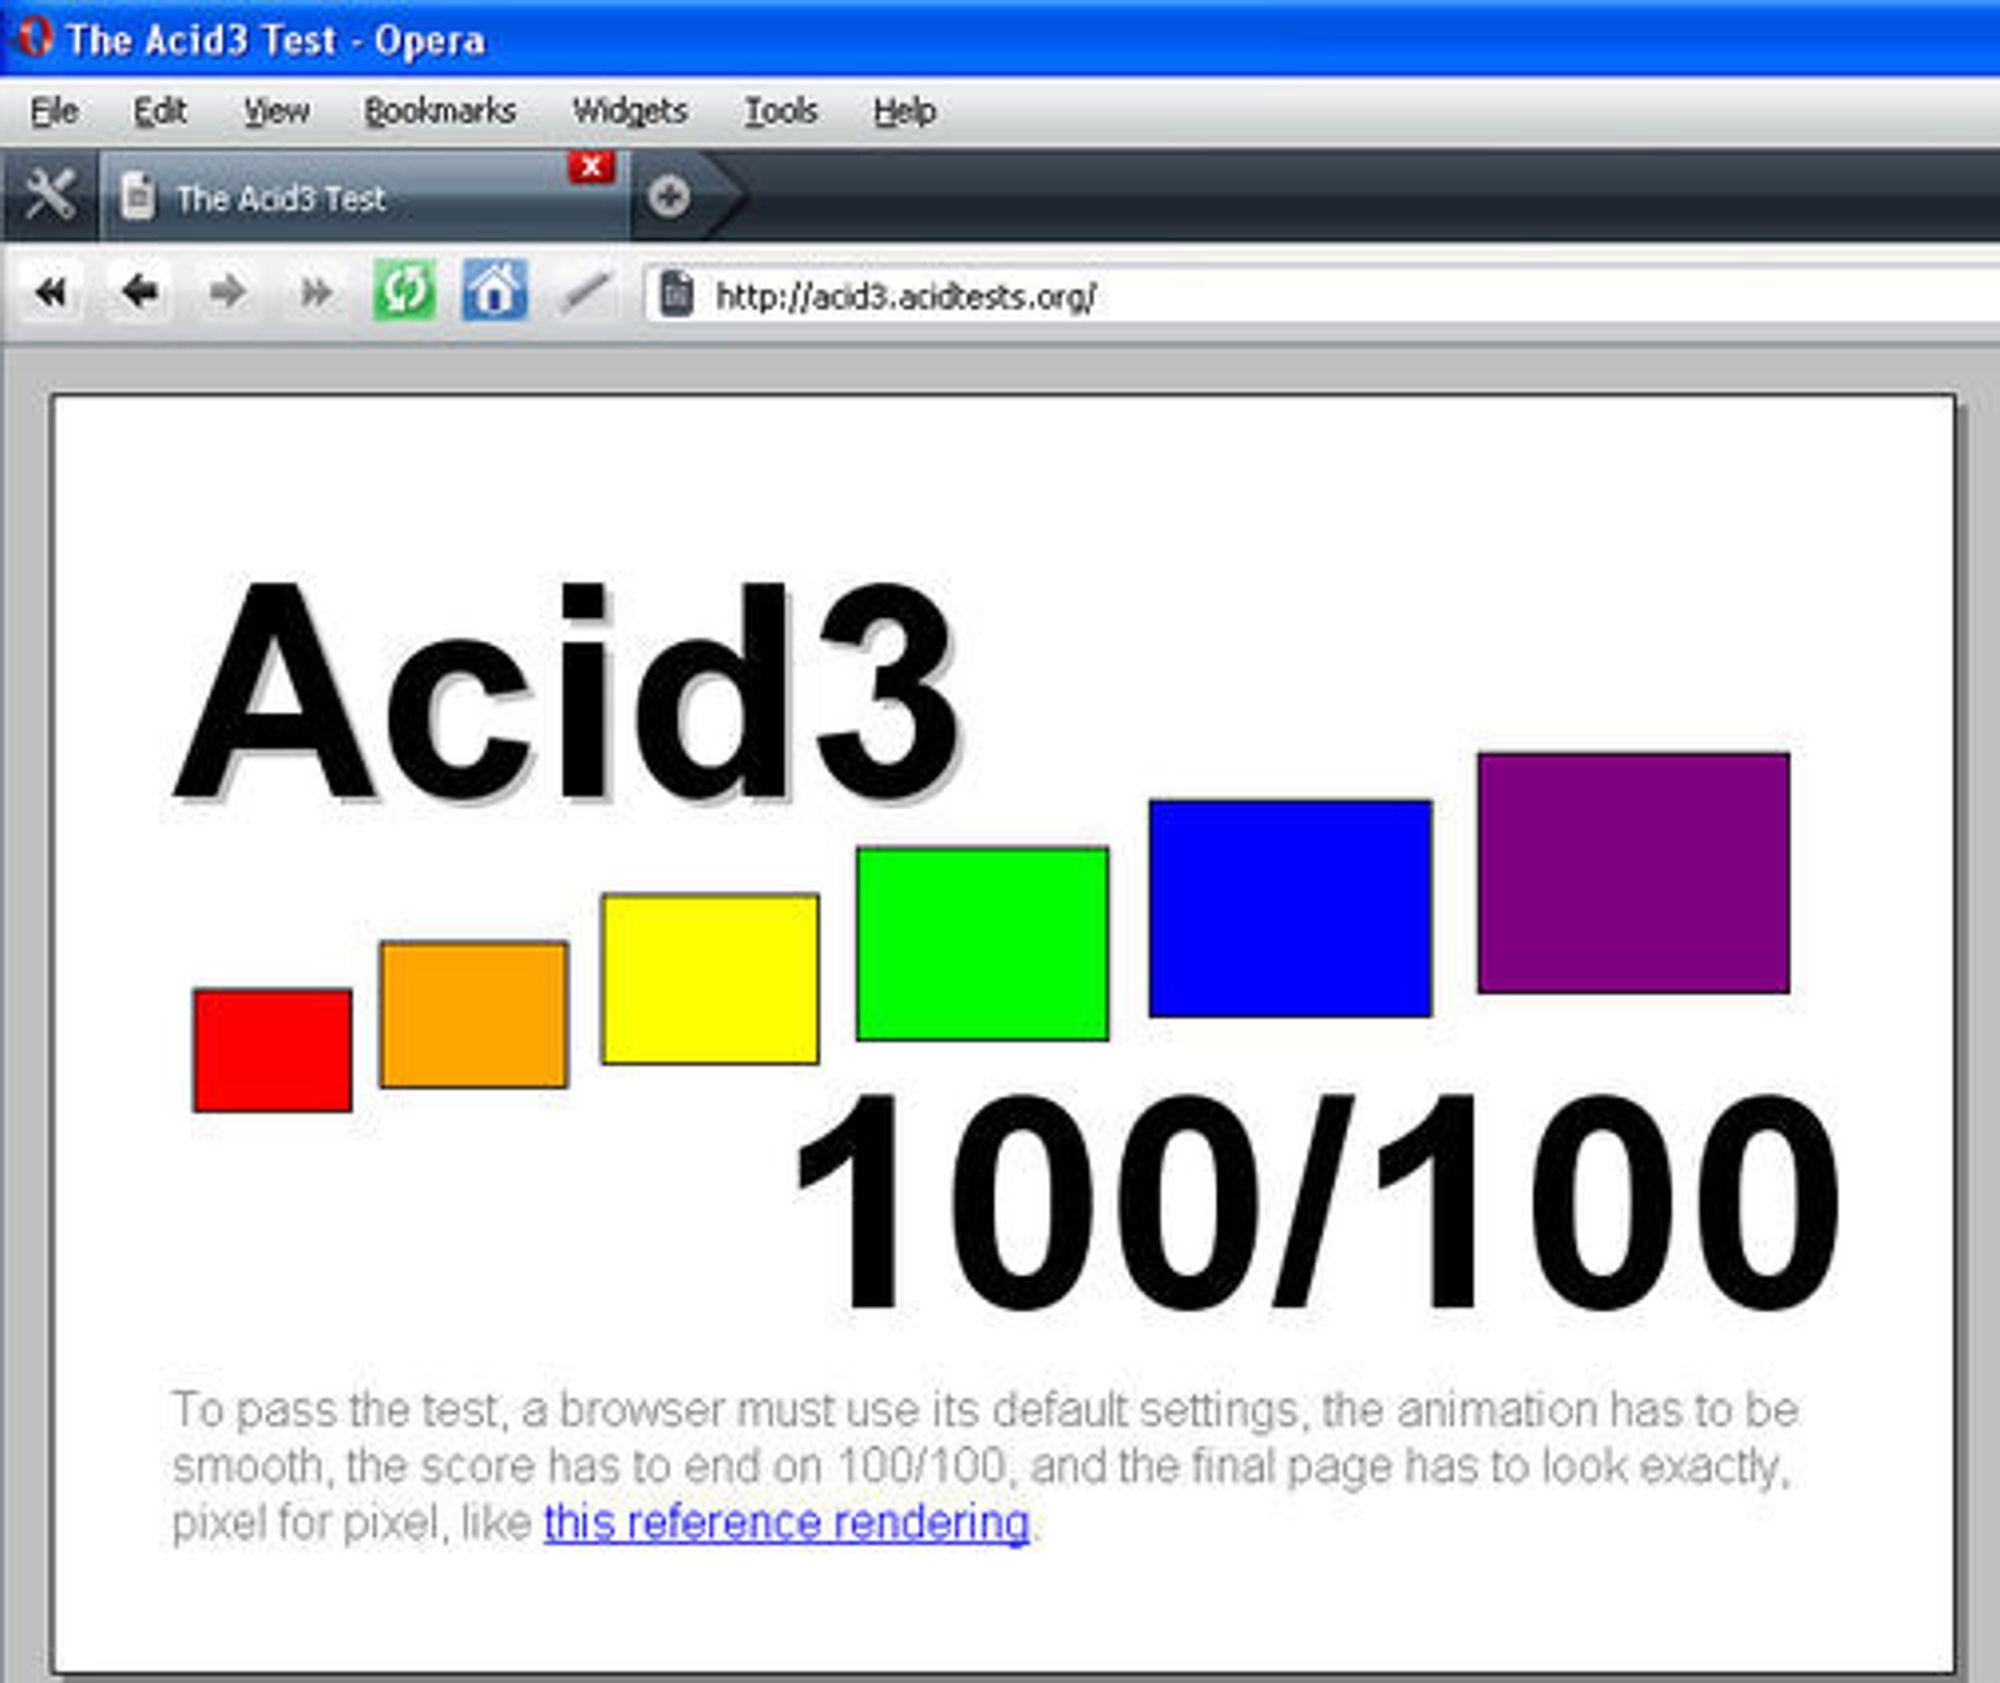 Opera 10 alpha greier Acid3-testen uten feil.